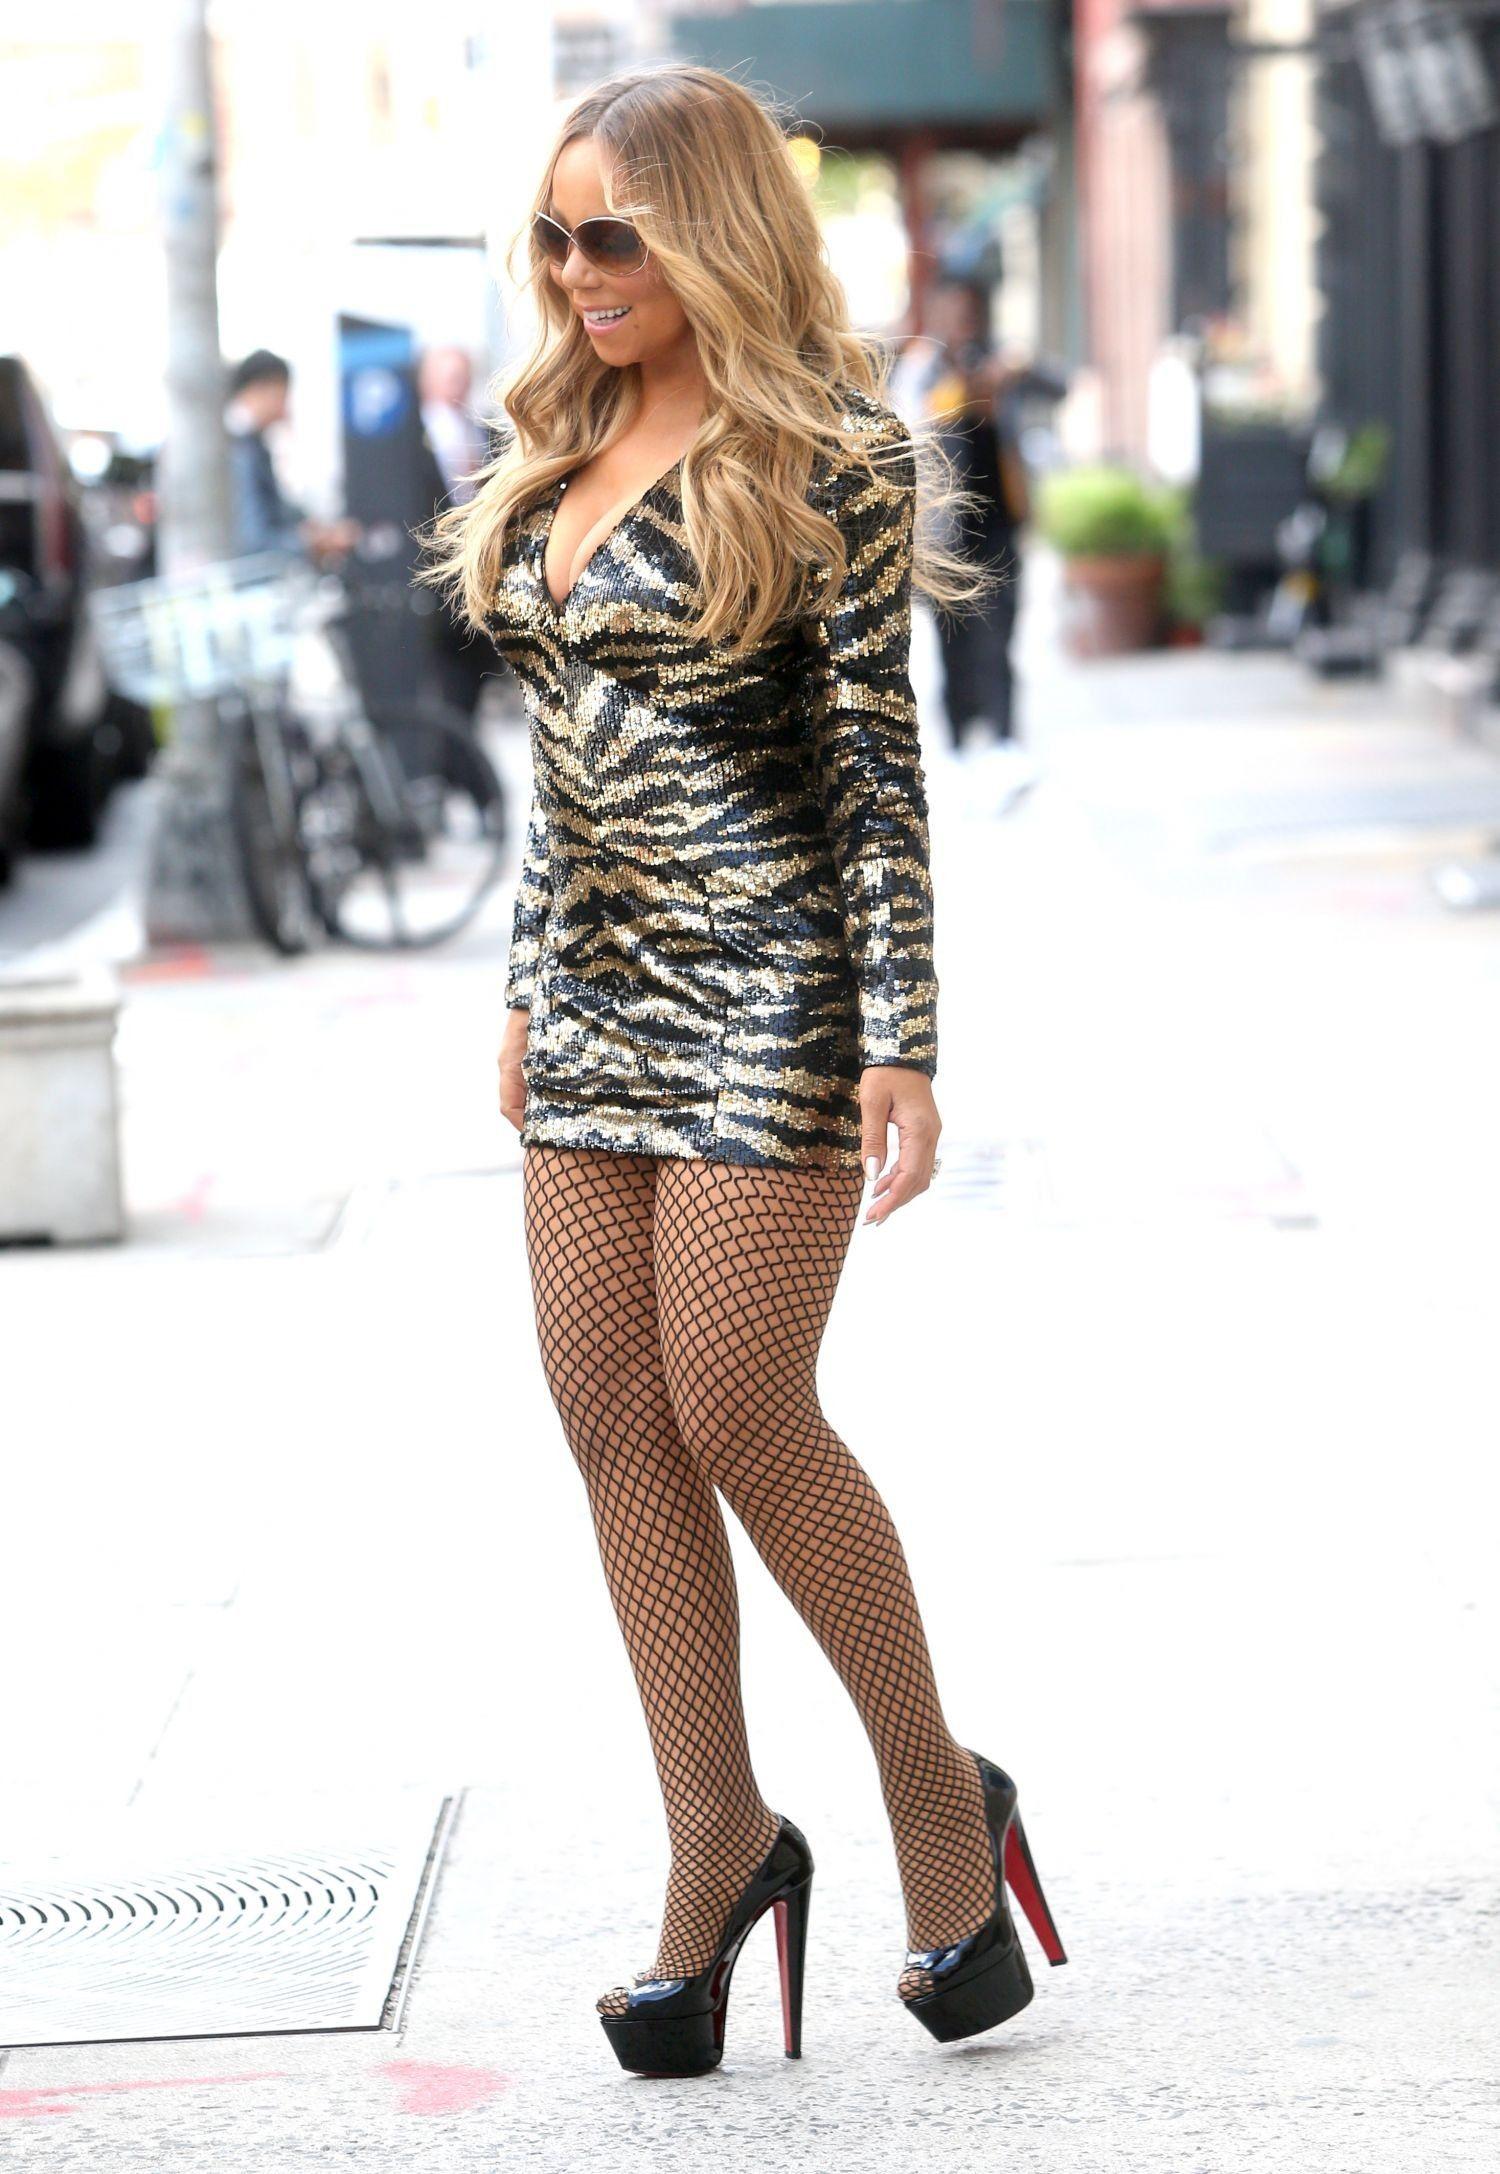 Photo  Mariah Carey In Short Dress Out In Nyc  Mariah -3324